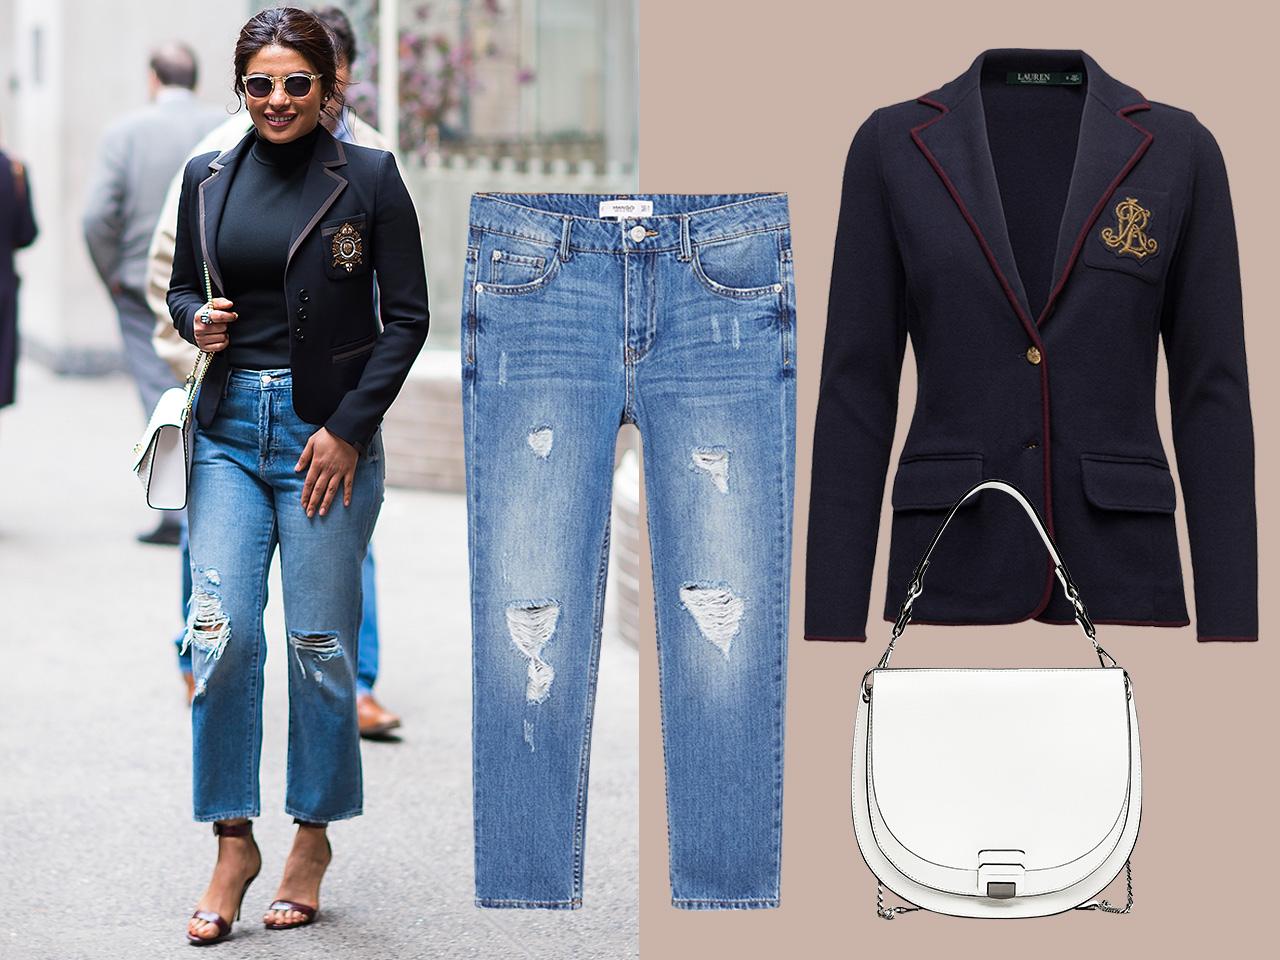 Priyanka Chopra wearing a celebrity denim outfit